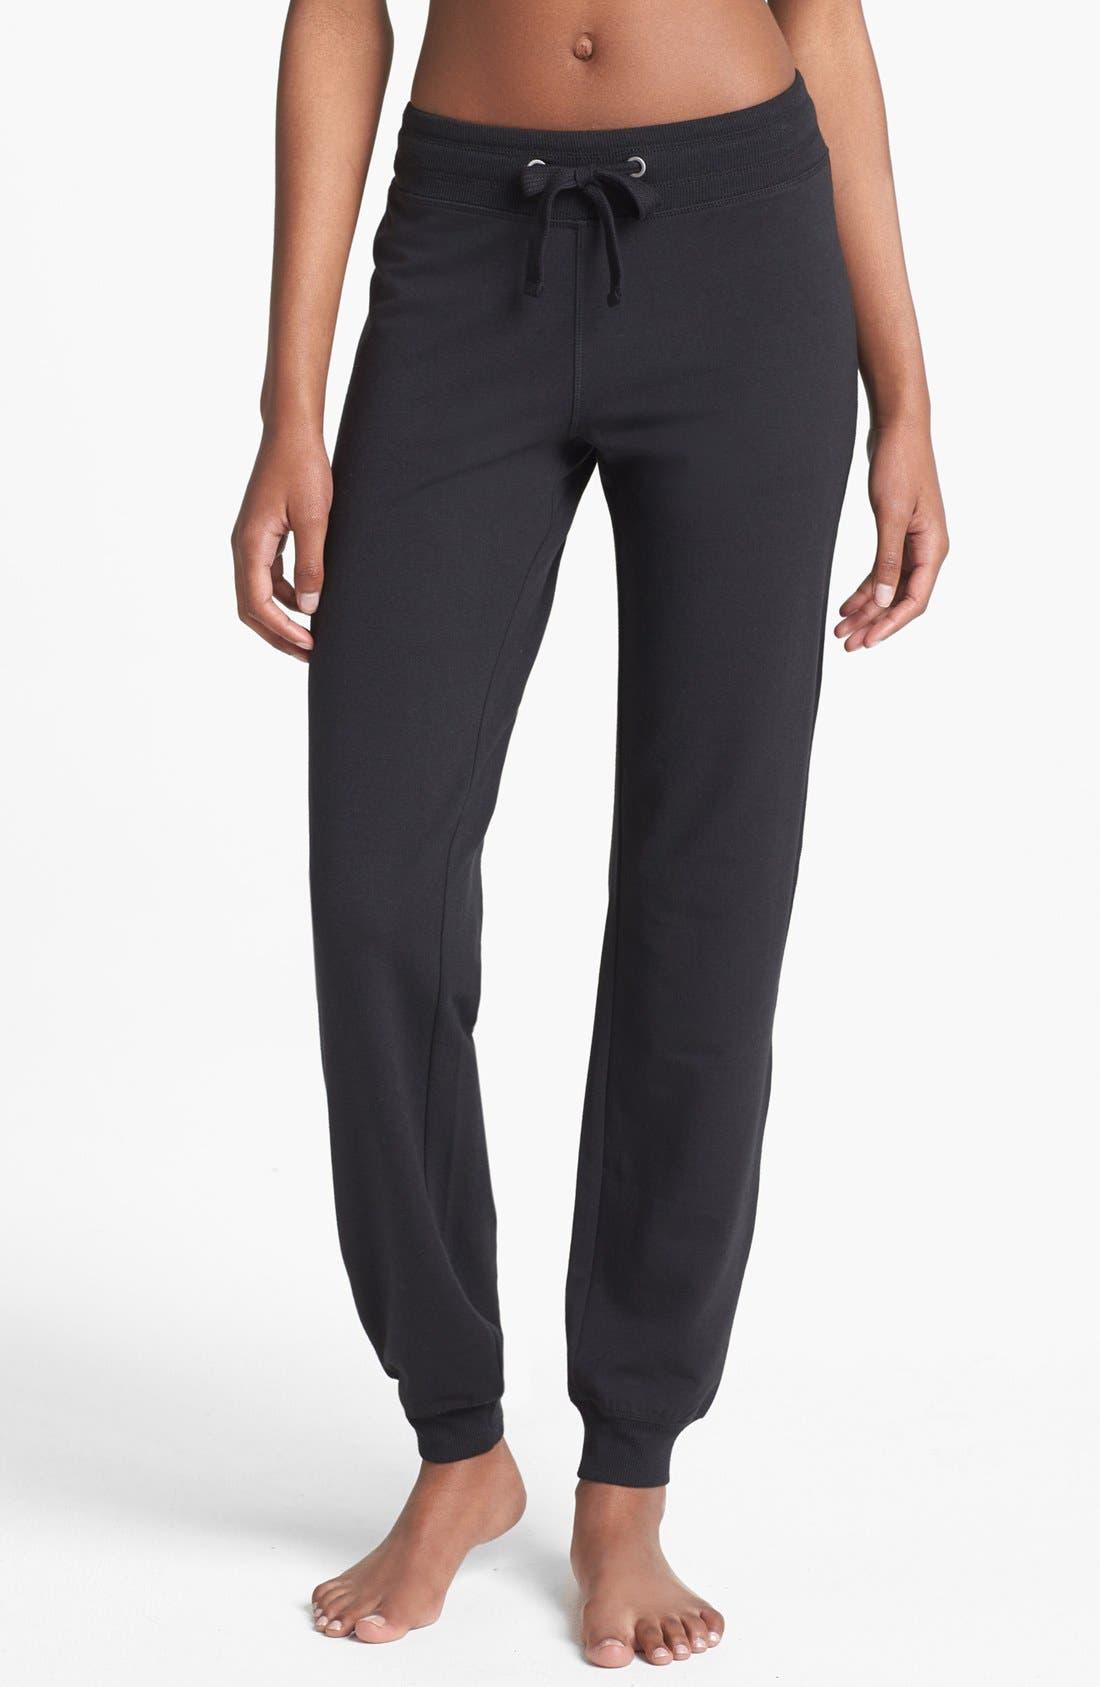 Alternate Image 1 Selected - Alo 'Cozy' Slim Sweatpants